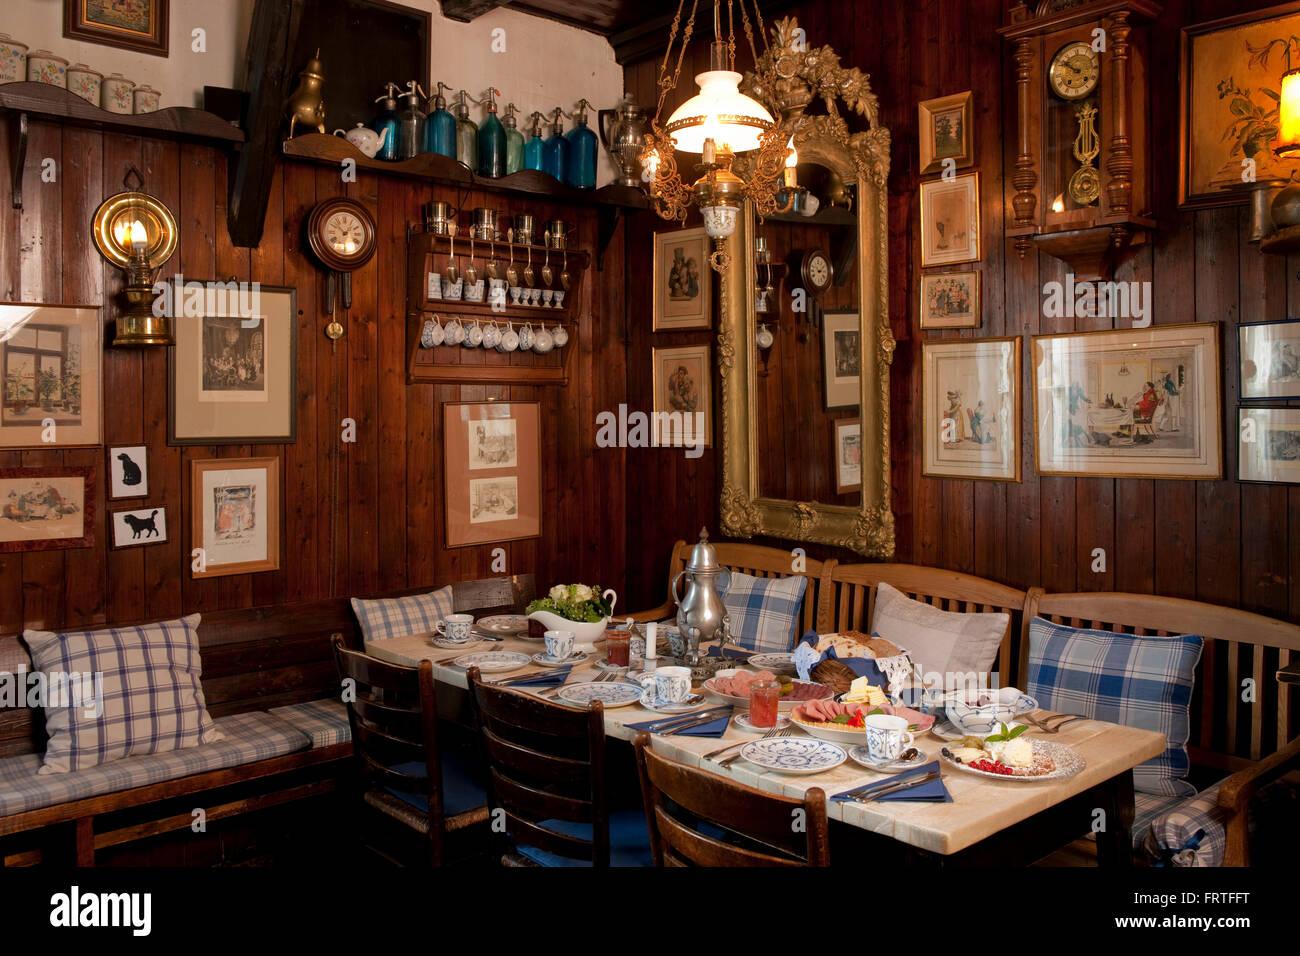 Bergische kaffeetafel restaurant